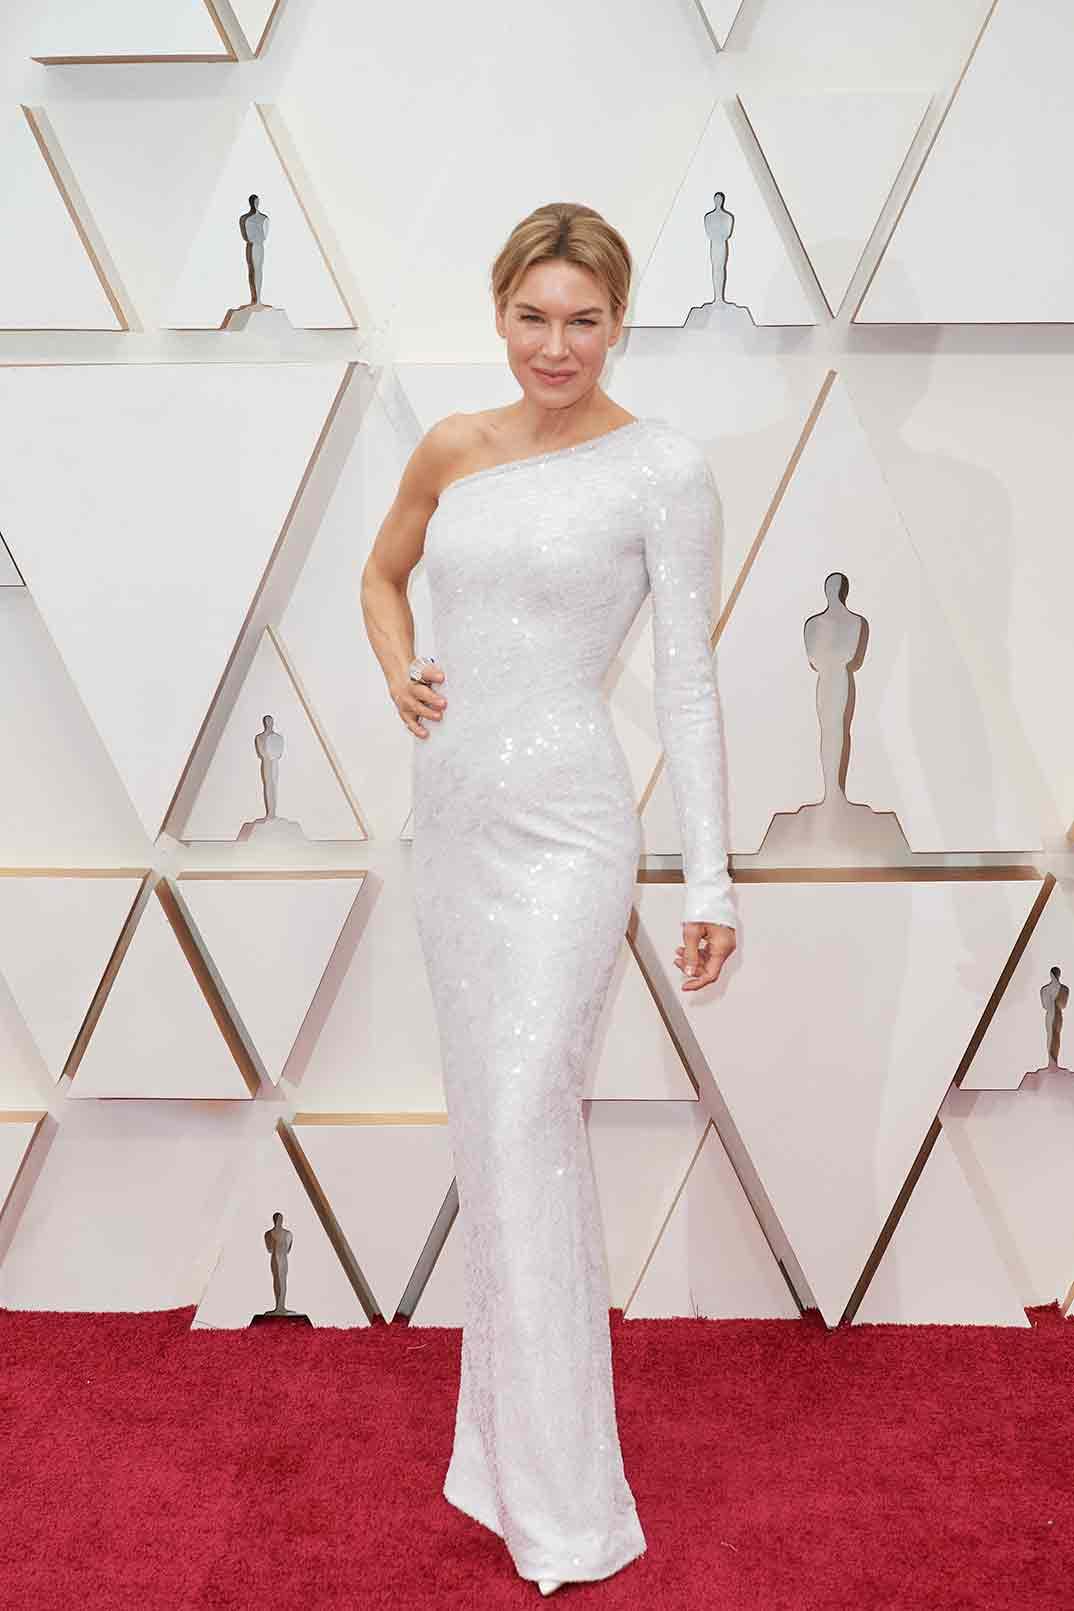 Renee Zellweger - Oscars 2020 © A.M.P.A.S.